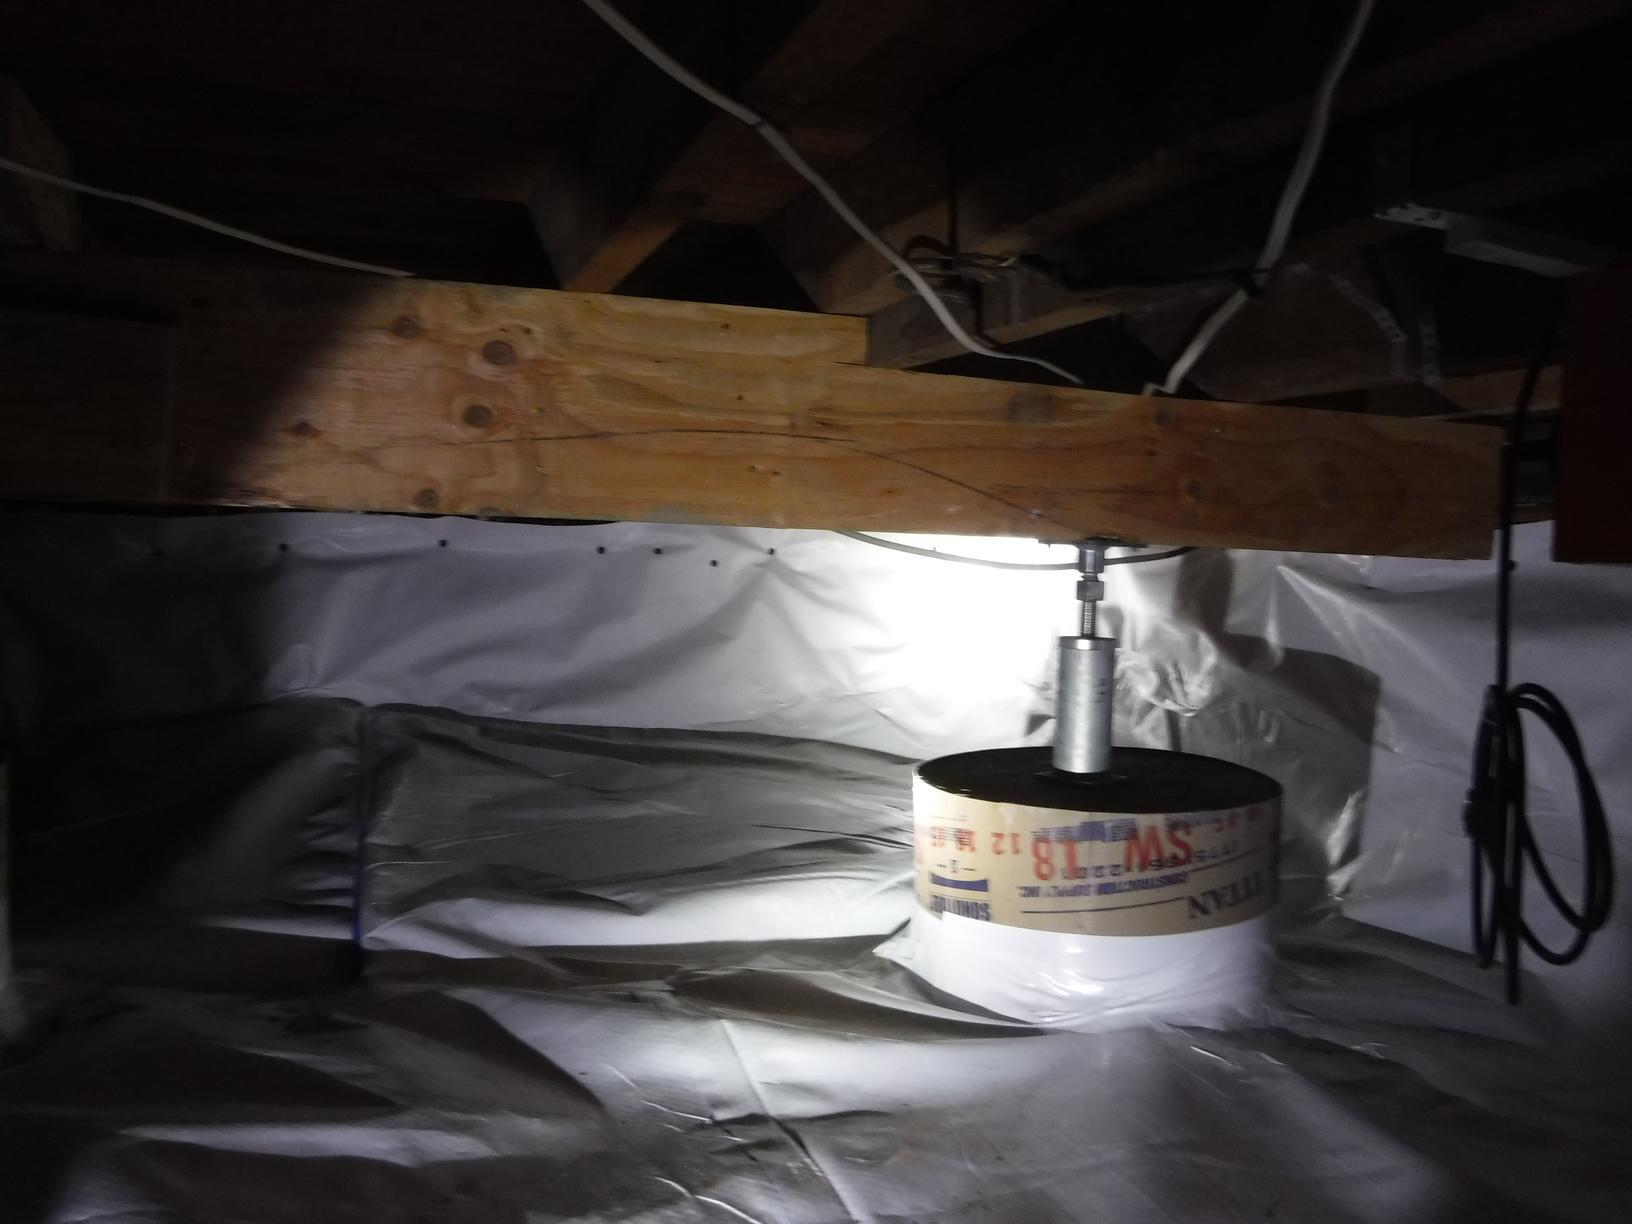 Sagging Floor Repair in Sparks, NV - After Photo